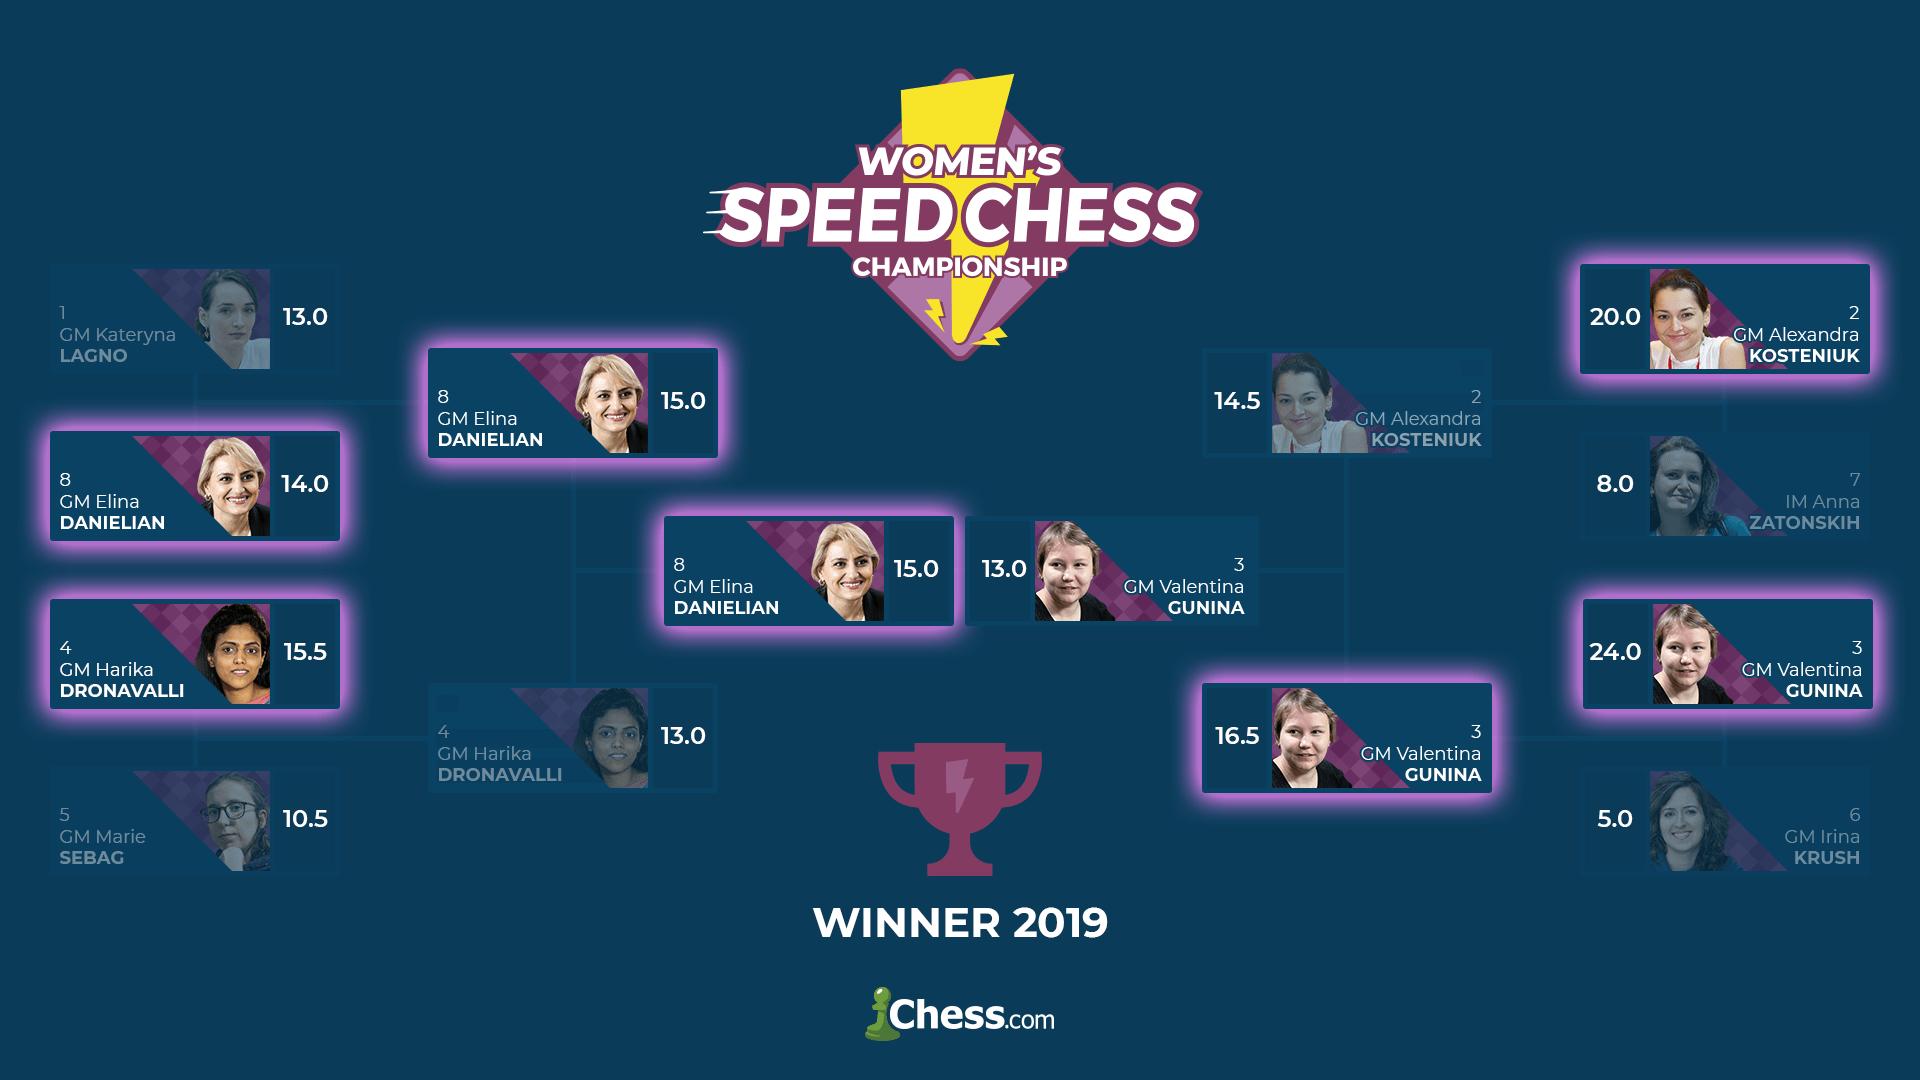 Women's Speed Chess Championship bracket